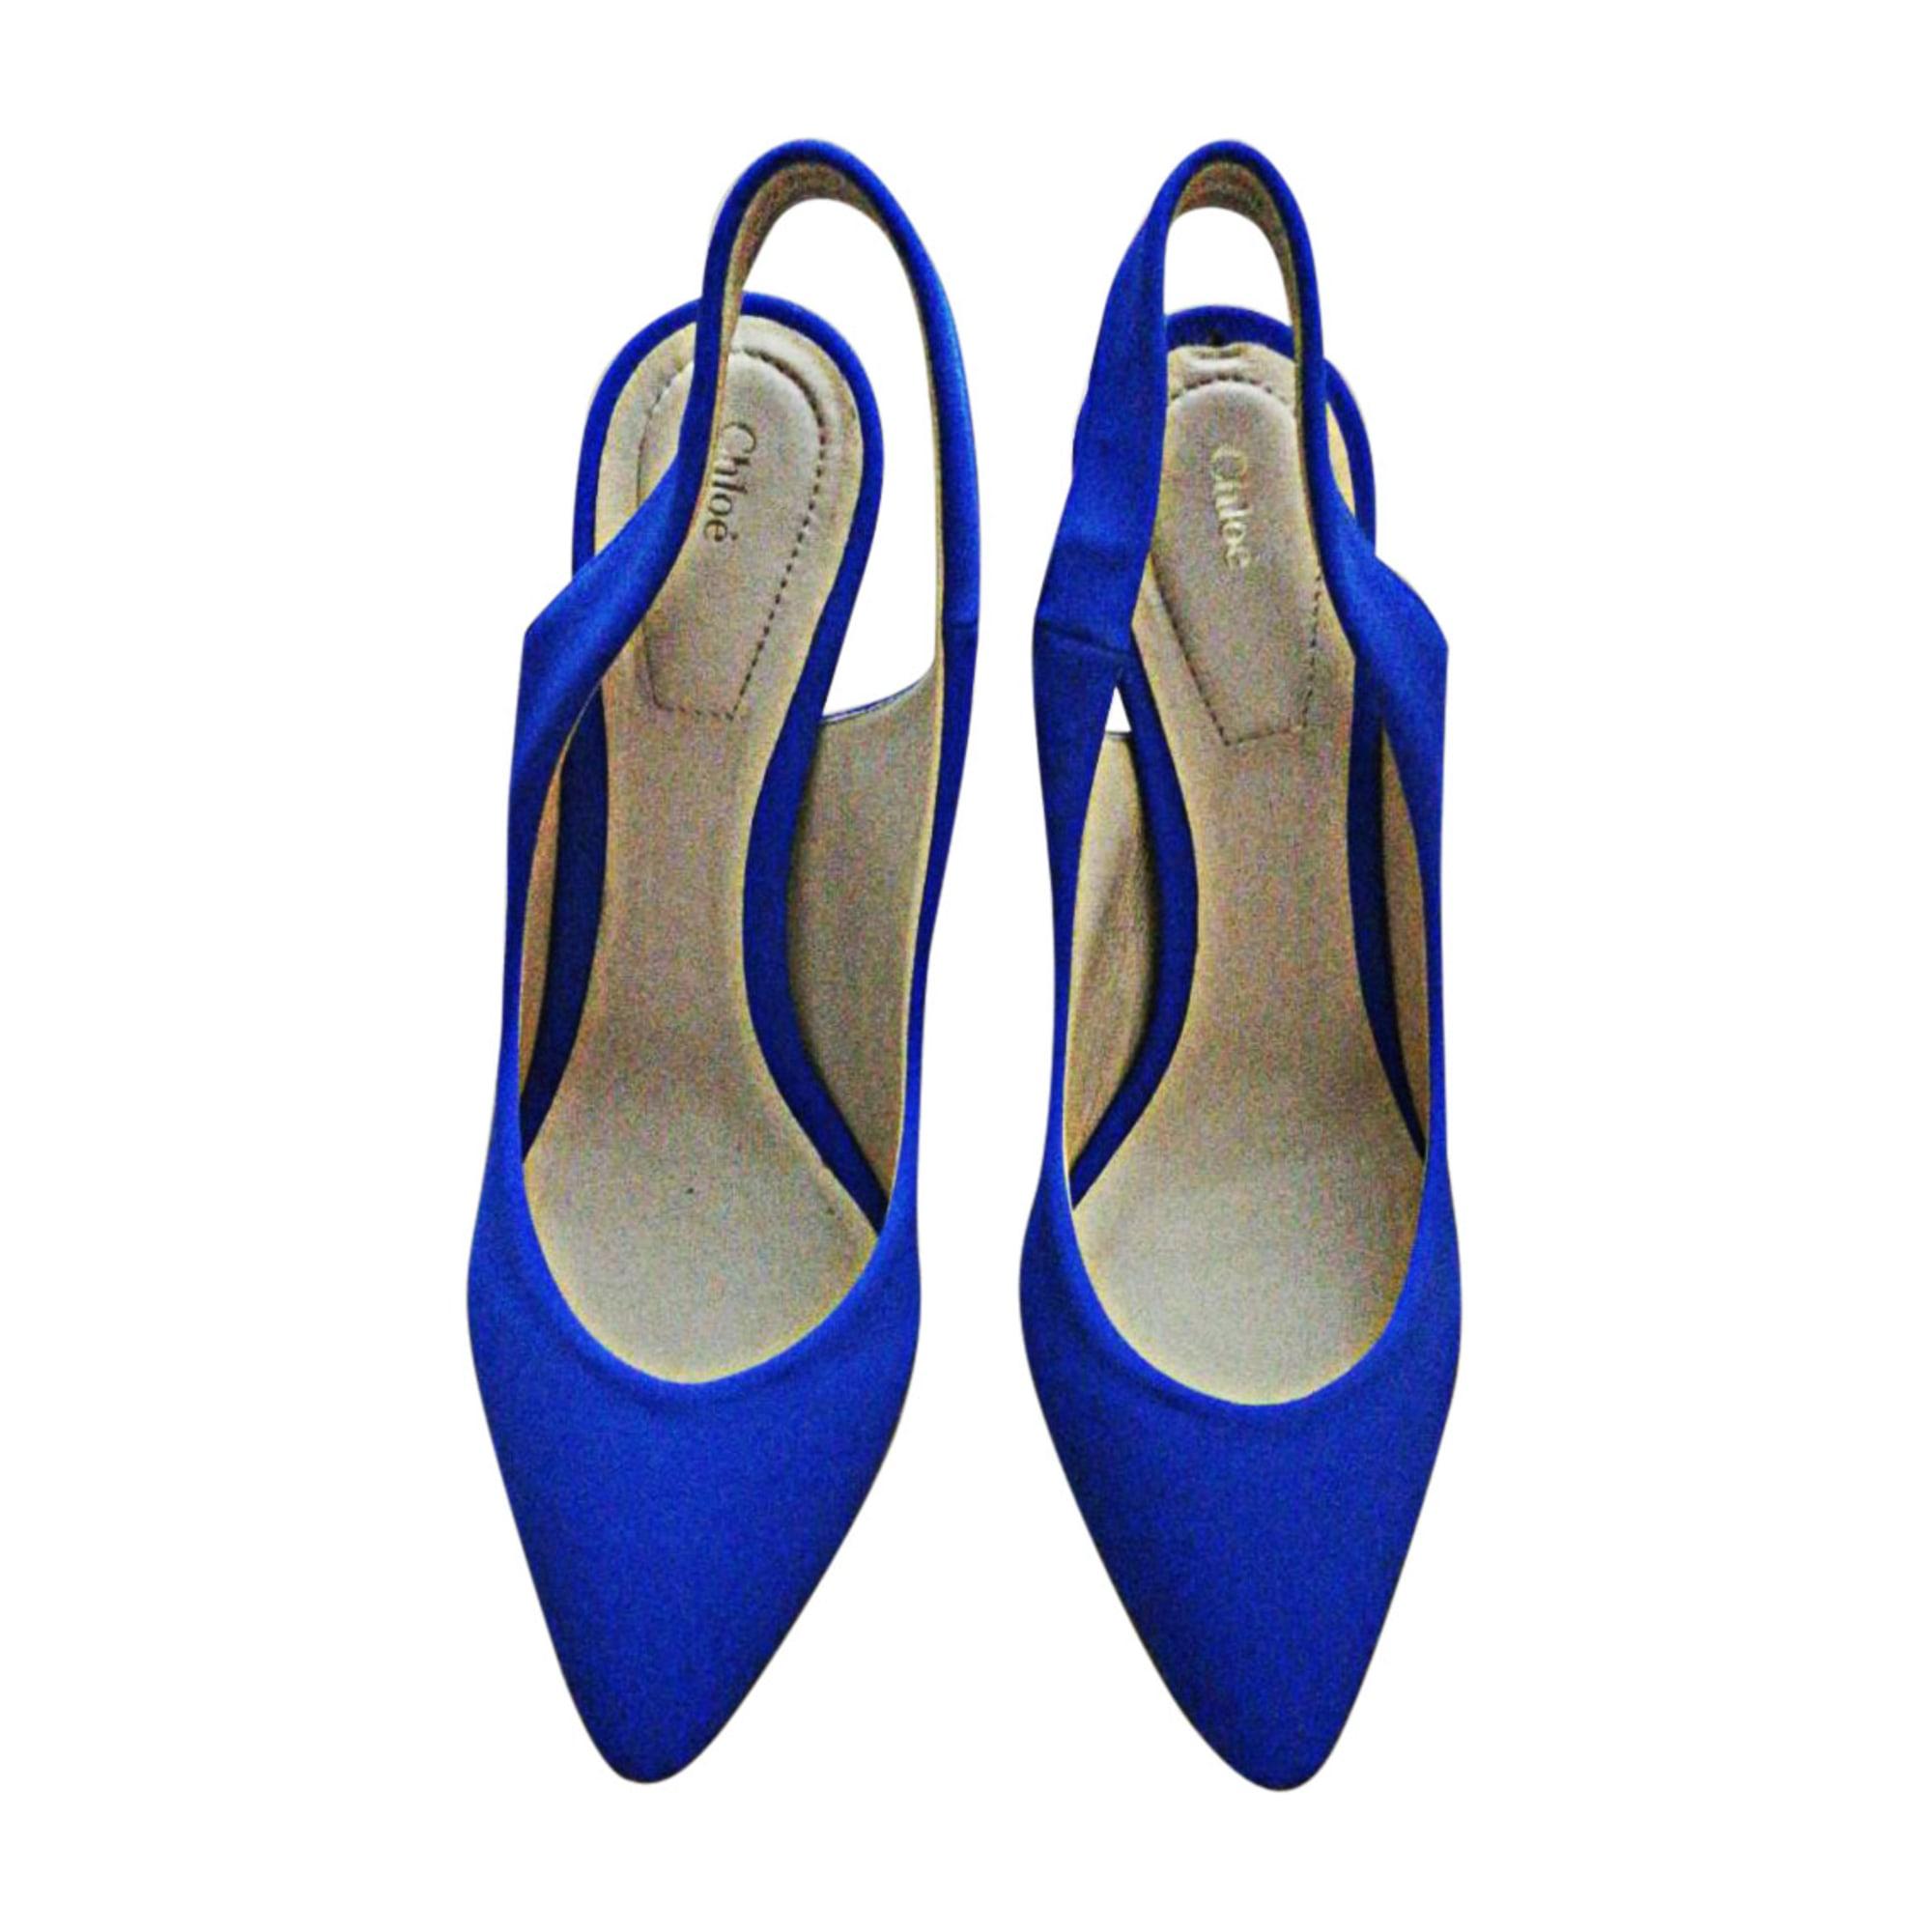 Escarpins CHLOÉ Bleu, bleu marine, bleu turquoise